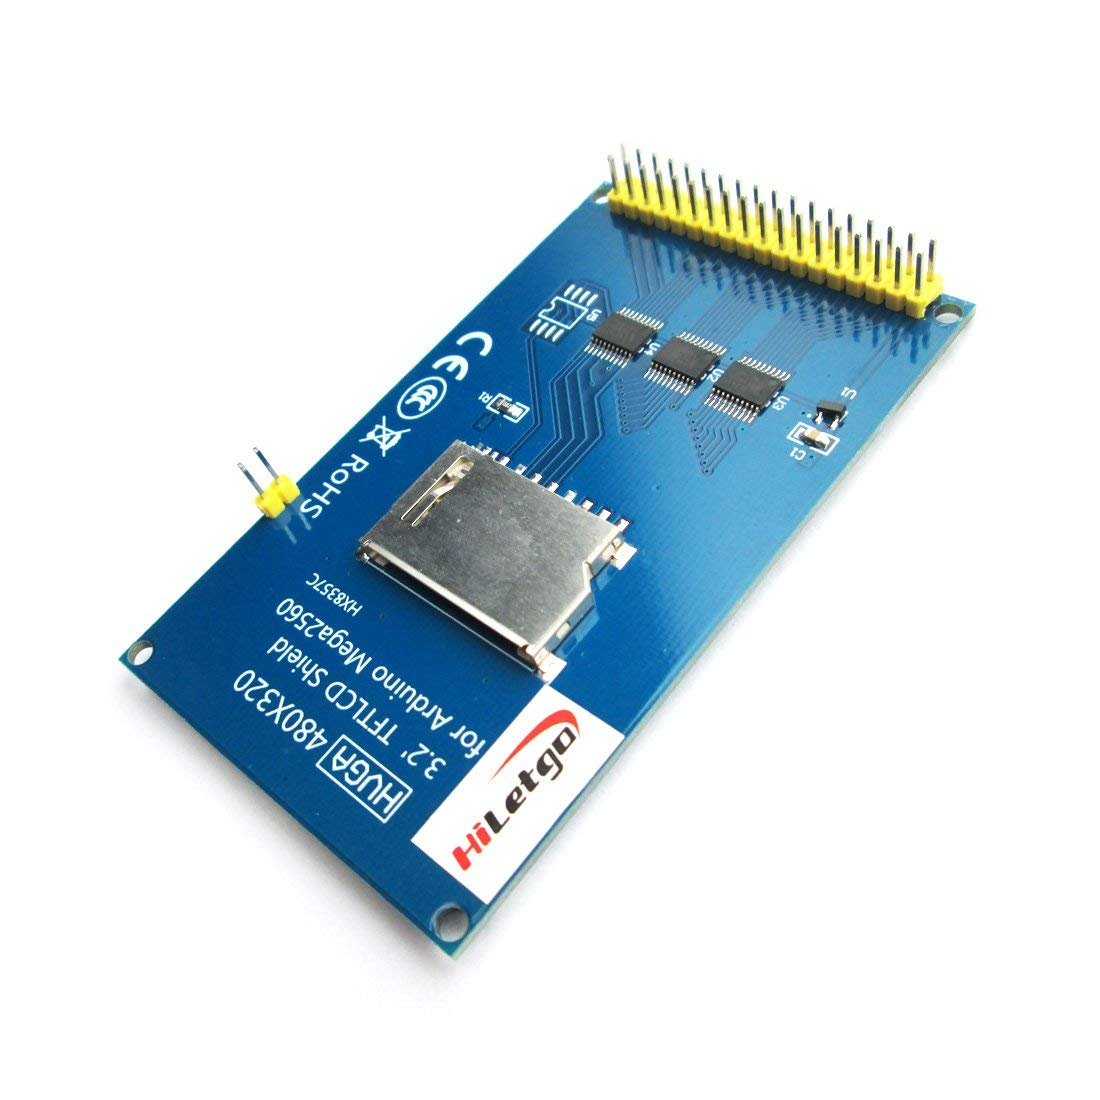 "3.2"" IPS TFT LCD Display ILI9486 480X320 36 Pins for Arduino Mega2560"